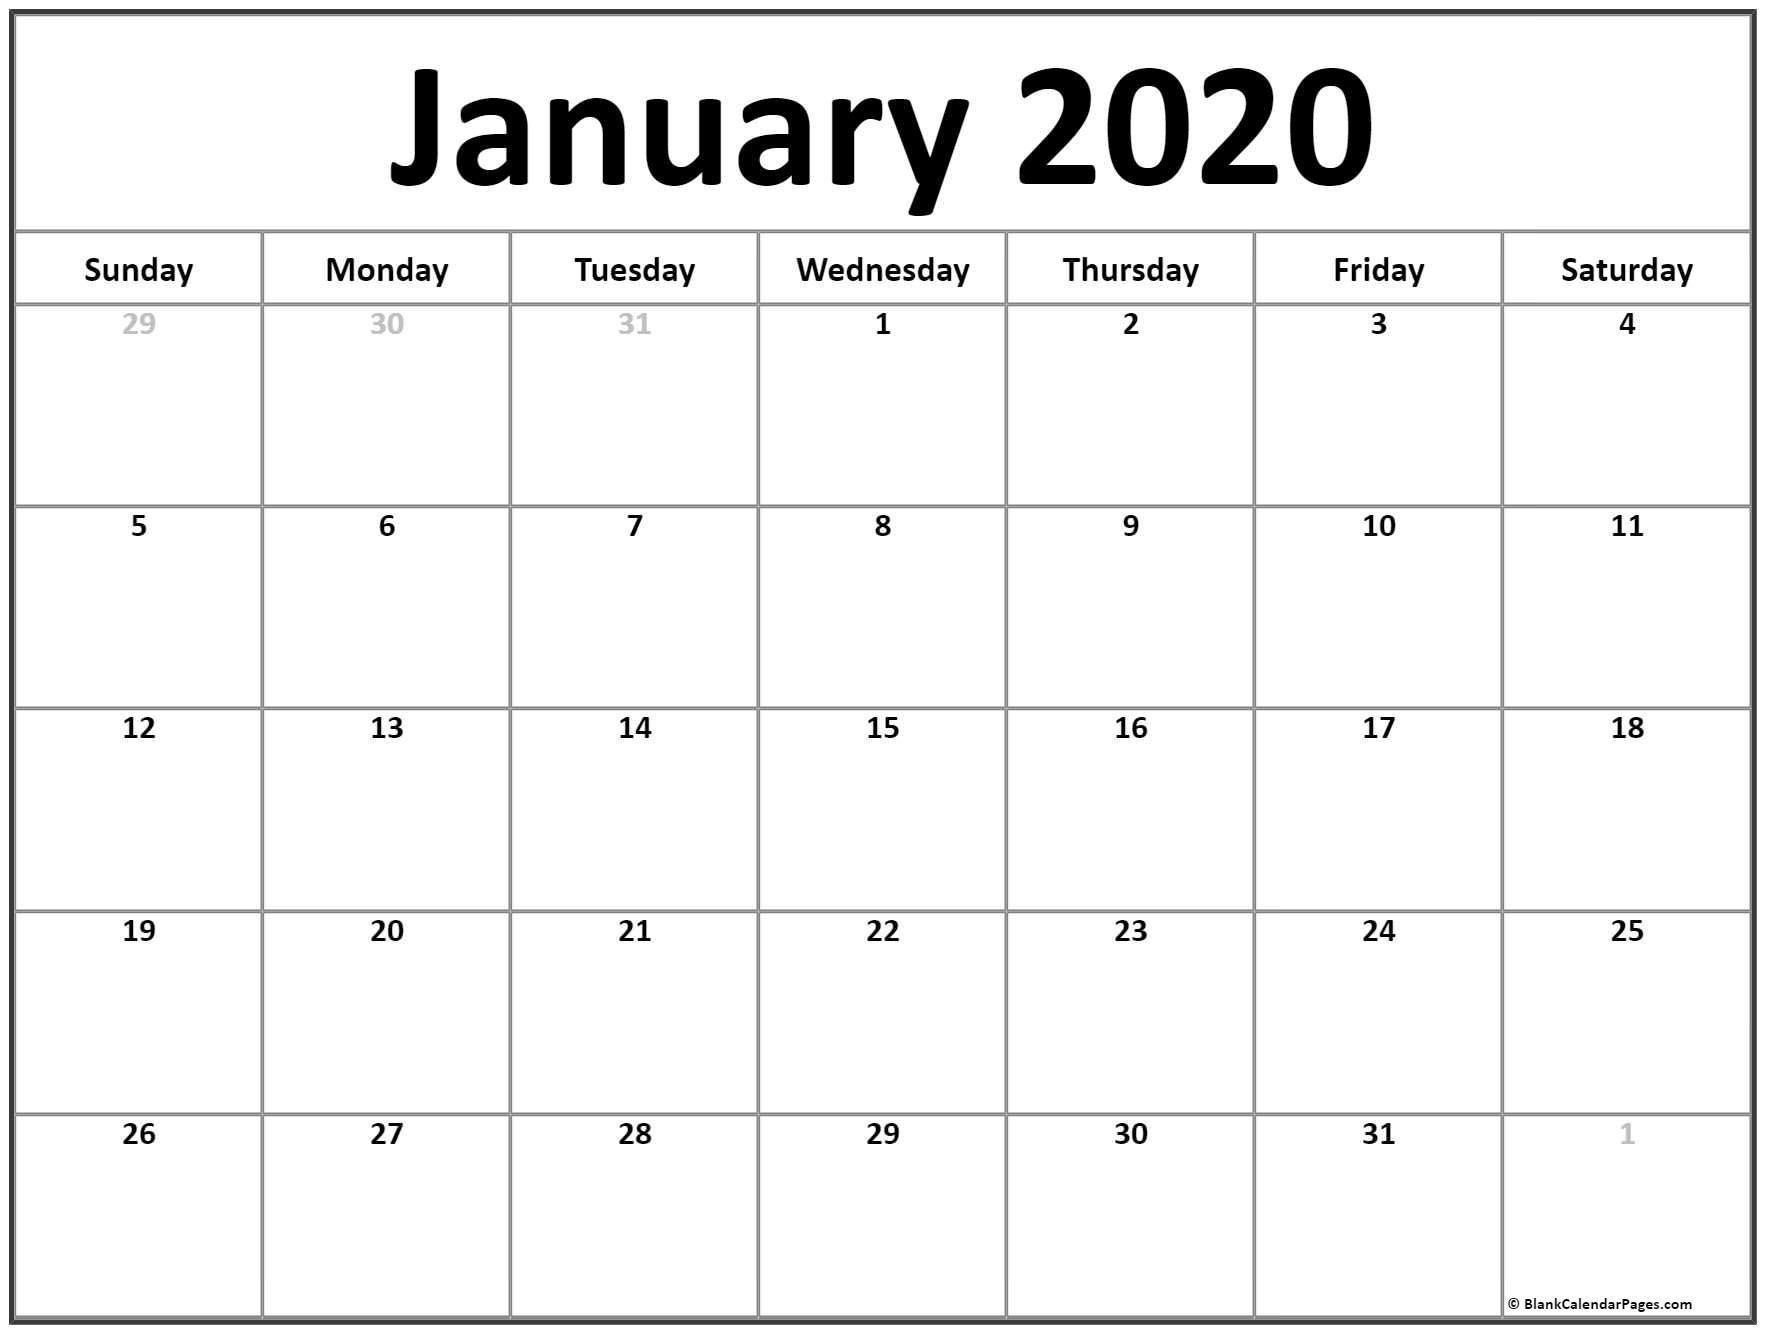 January 2020 Calendar Printable - Togo.wpart.co